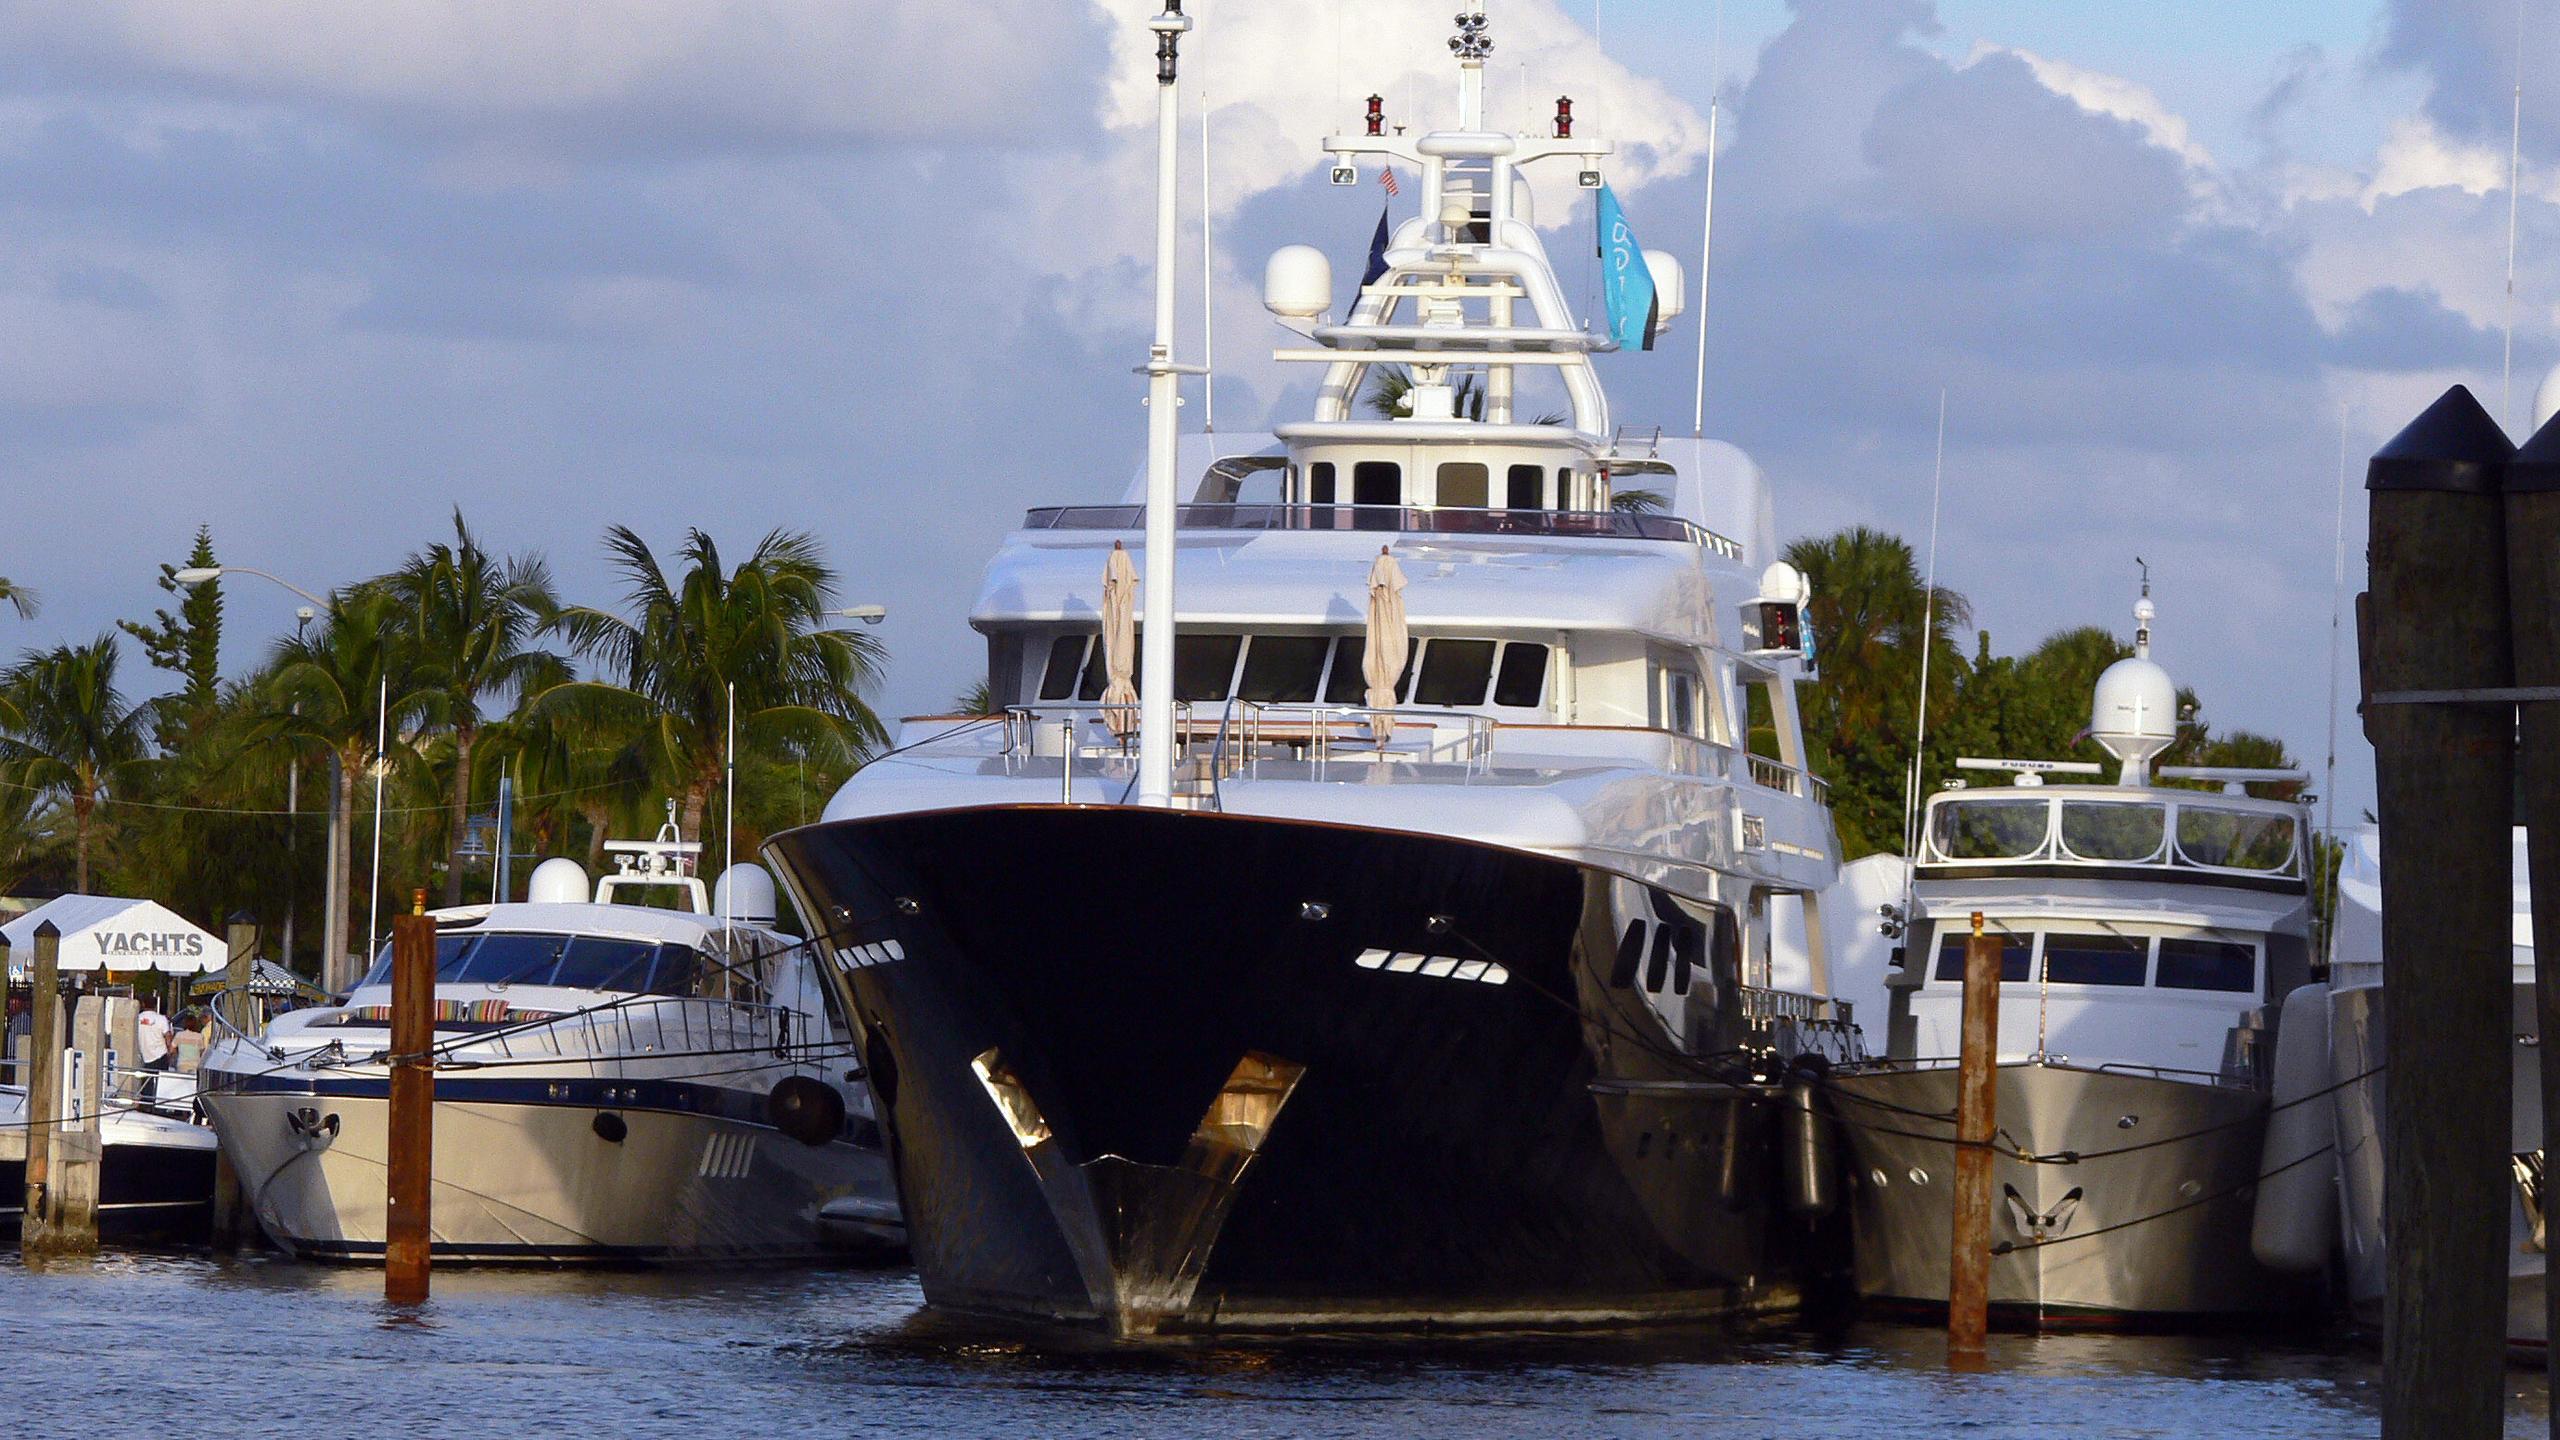 noble-house-motor-yacht-sensation-2006-53m-bow